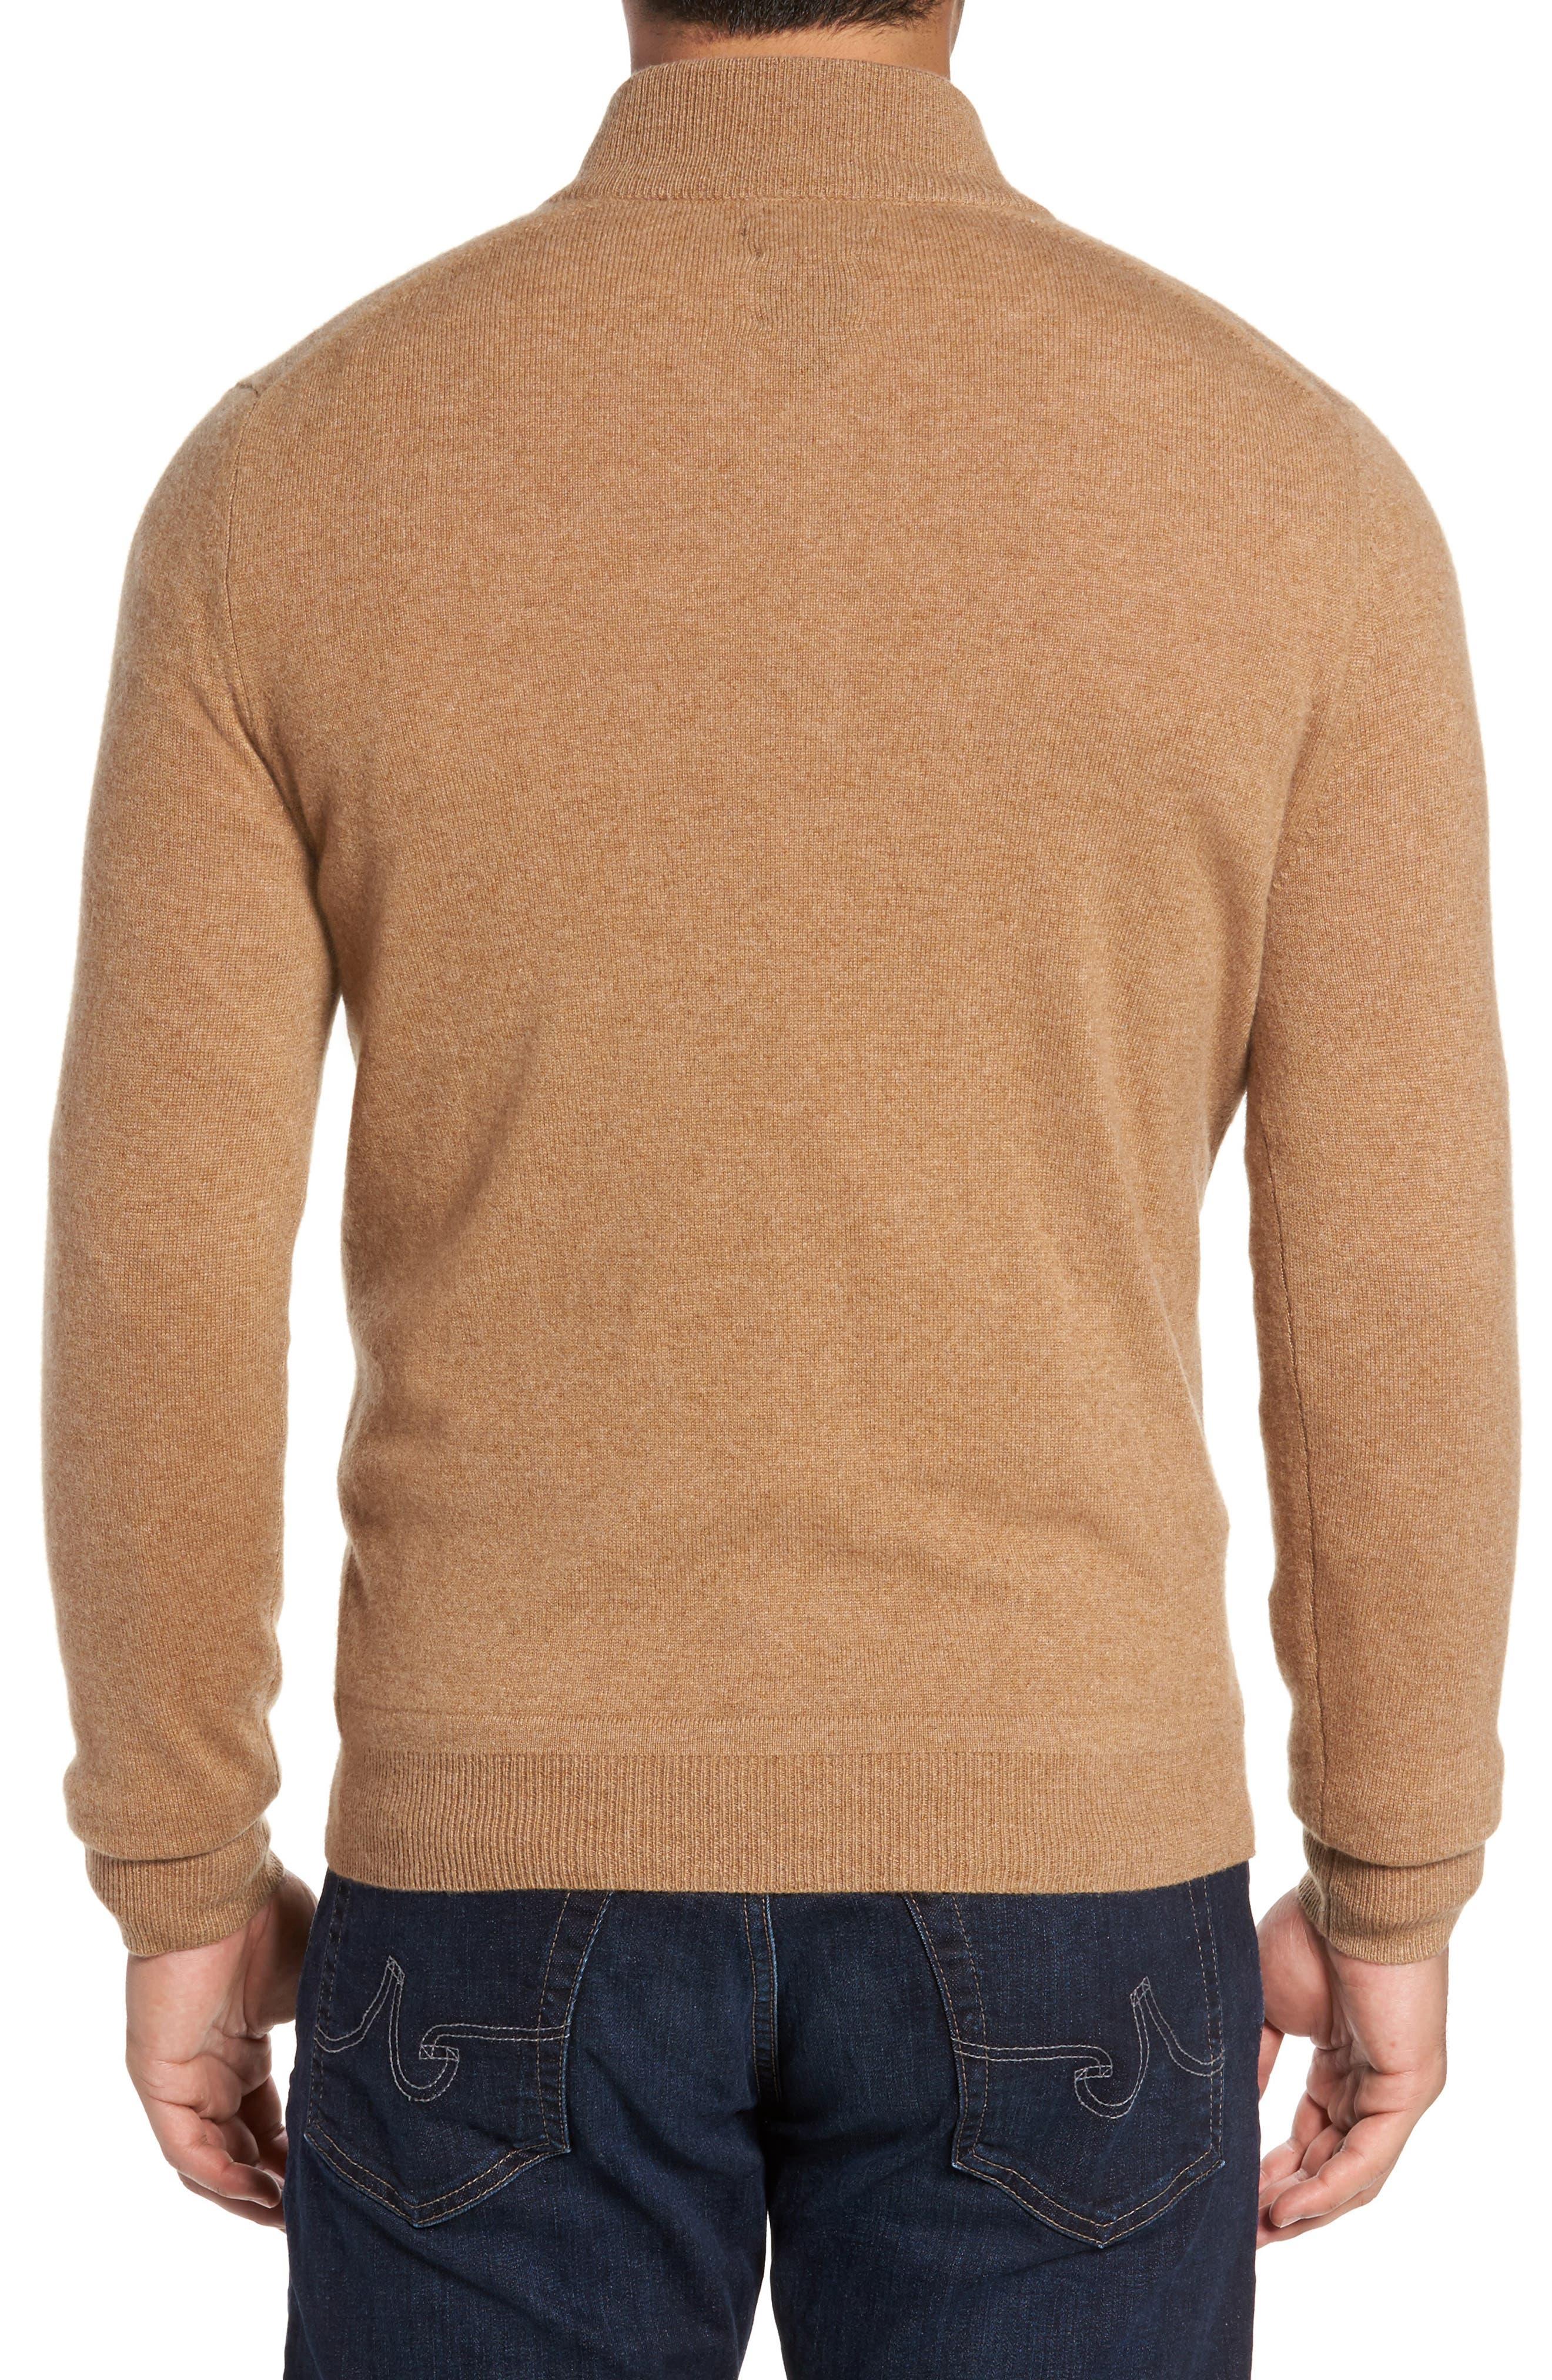 Cashmere Quarter Zip Sweater,                             Alternate thumbnail 2, color,                             Brown Bear